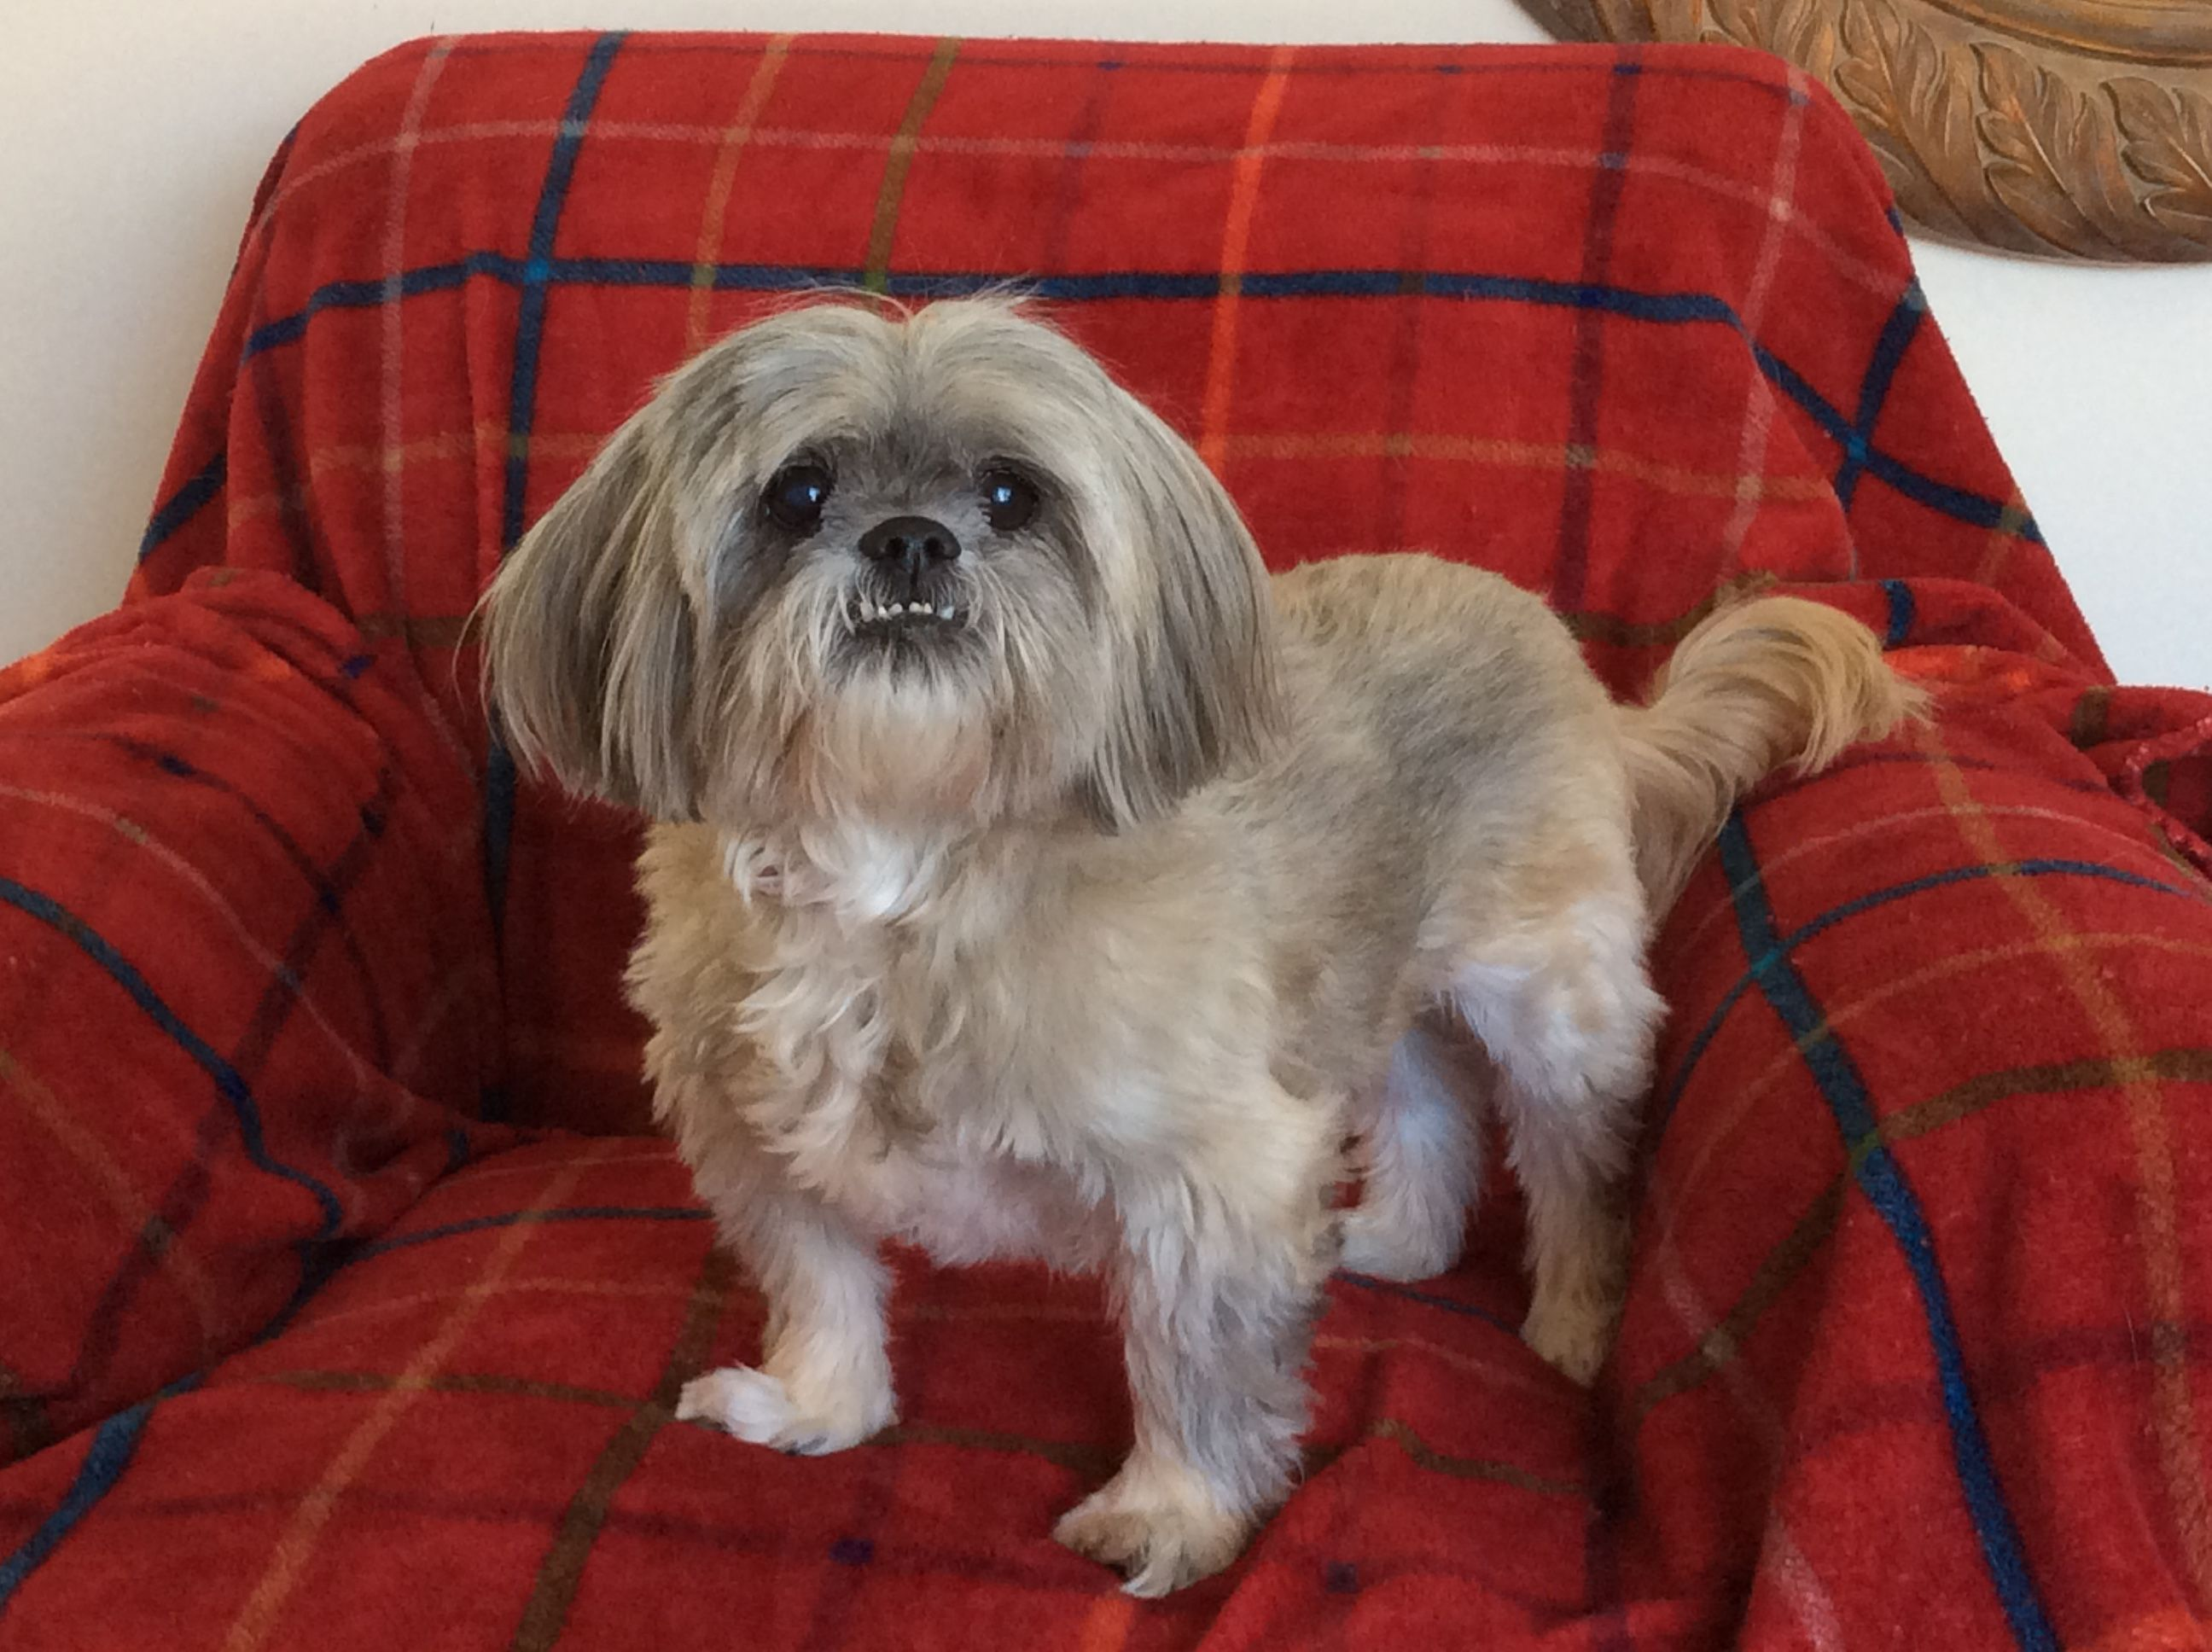 Shih Tzu Dog For Adoption In Florence Ky Adn 437127 On Puppyfinder